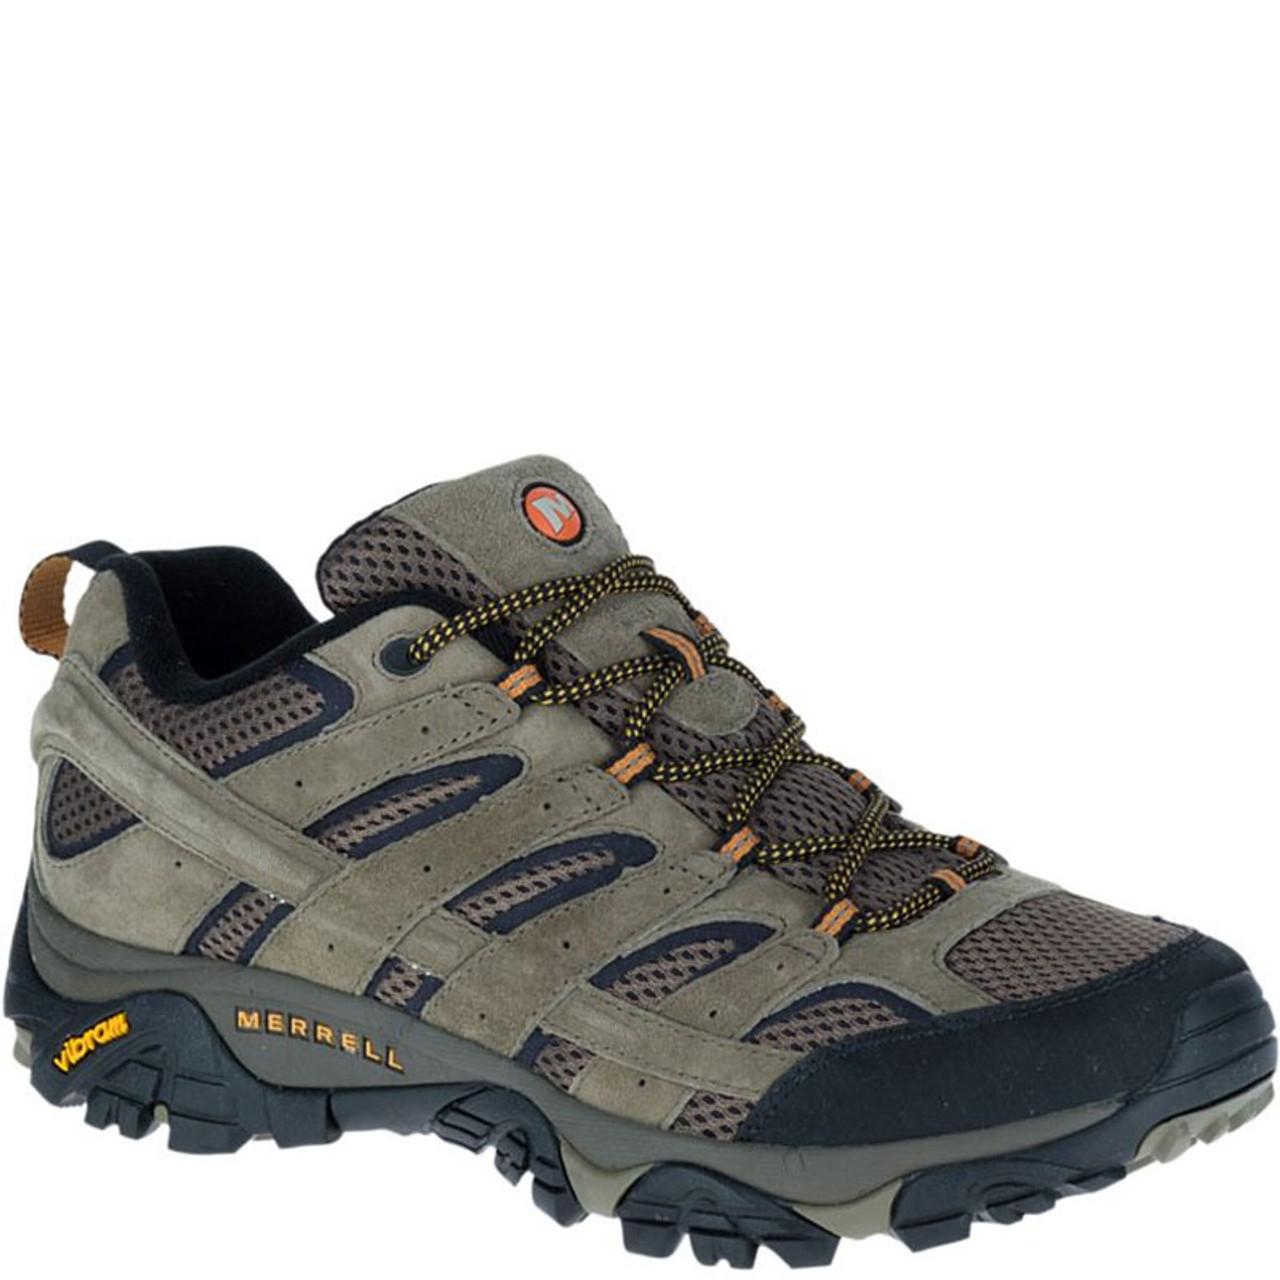 f64a7493 Merrell J06011 Men's MOAB 2 VENTILATOR Hiking Shoes